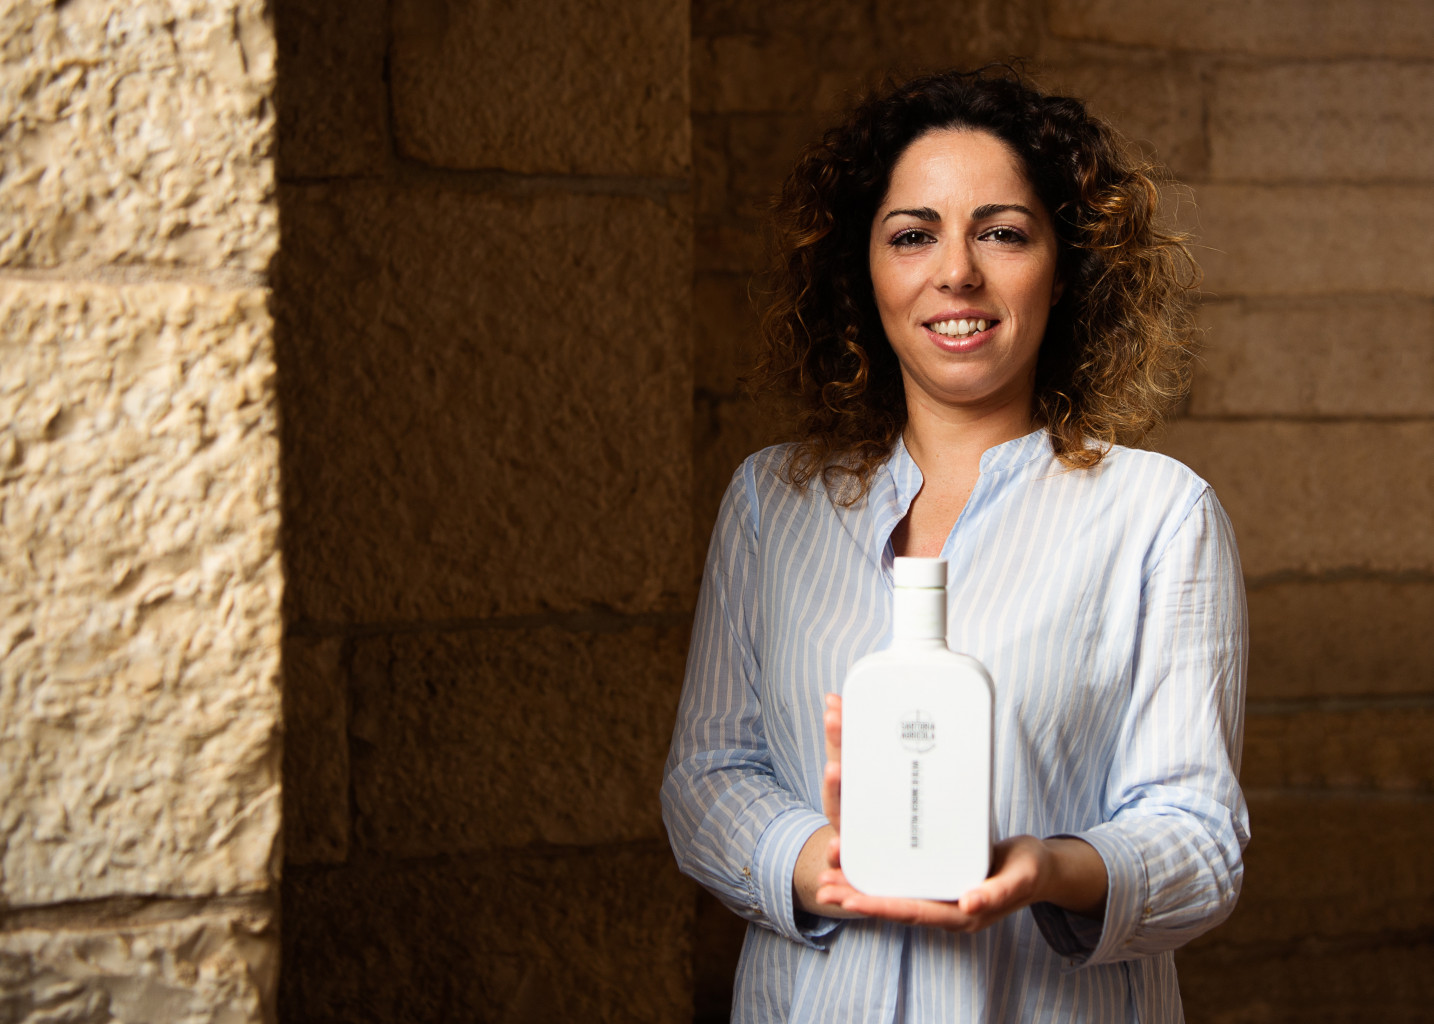 Olio extravergine di oliva o olio di semi?